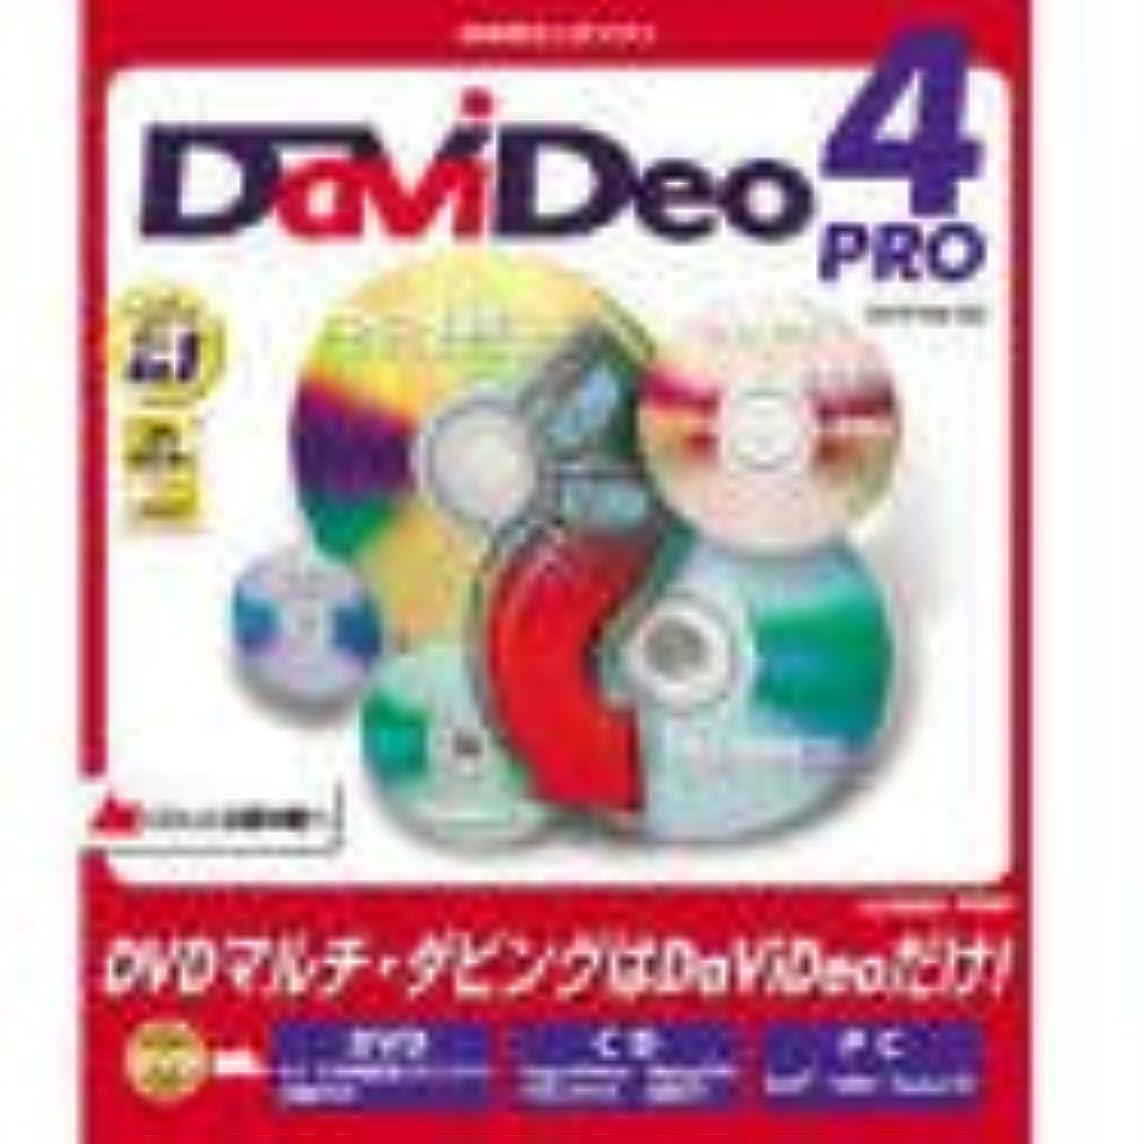 DaViDeo 4 Pro